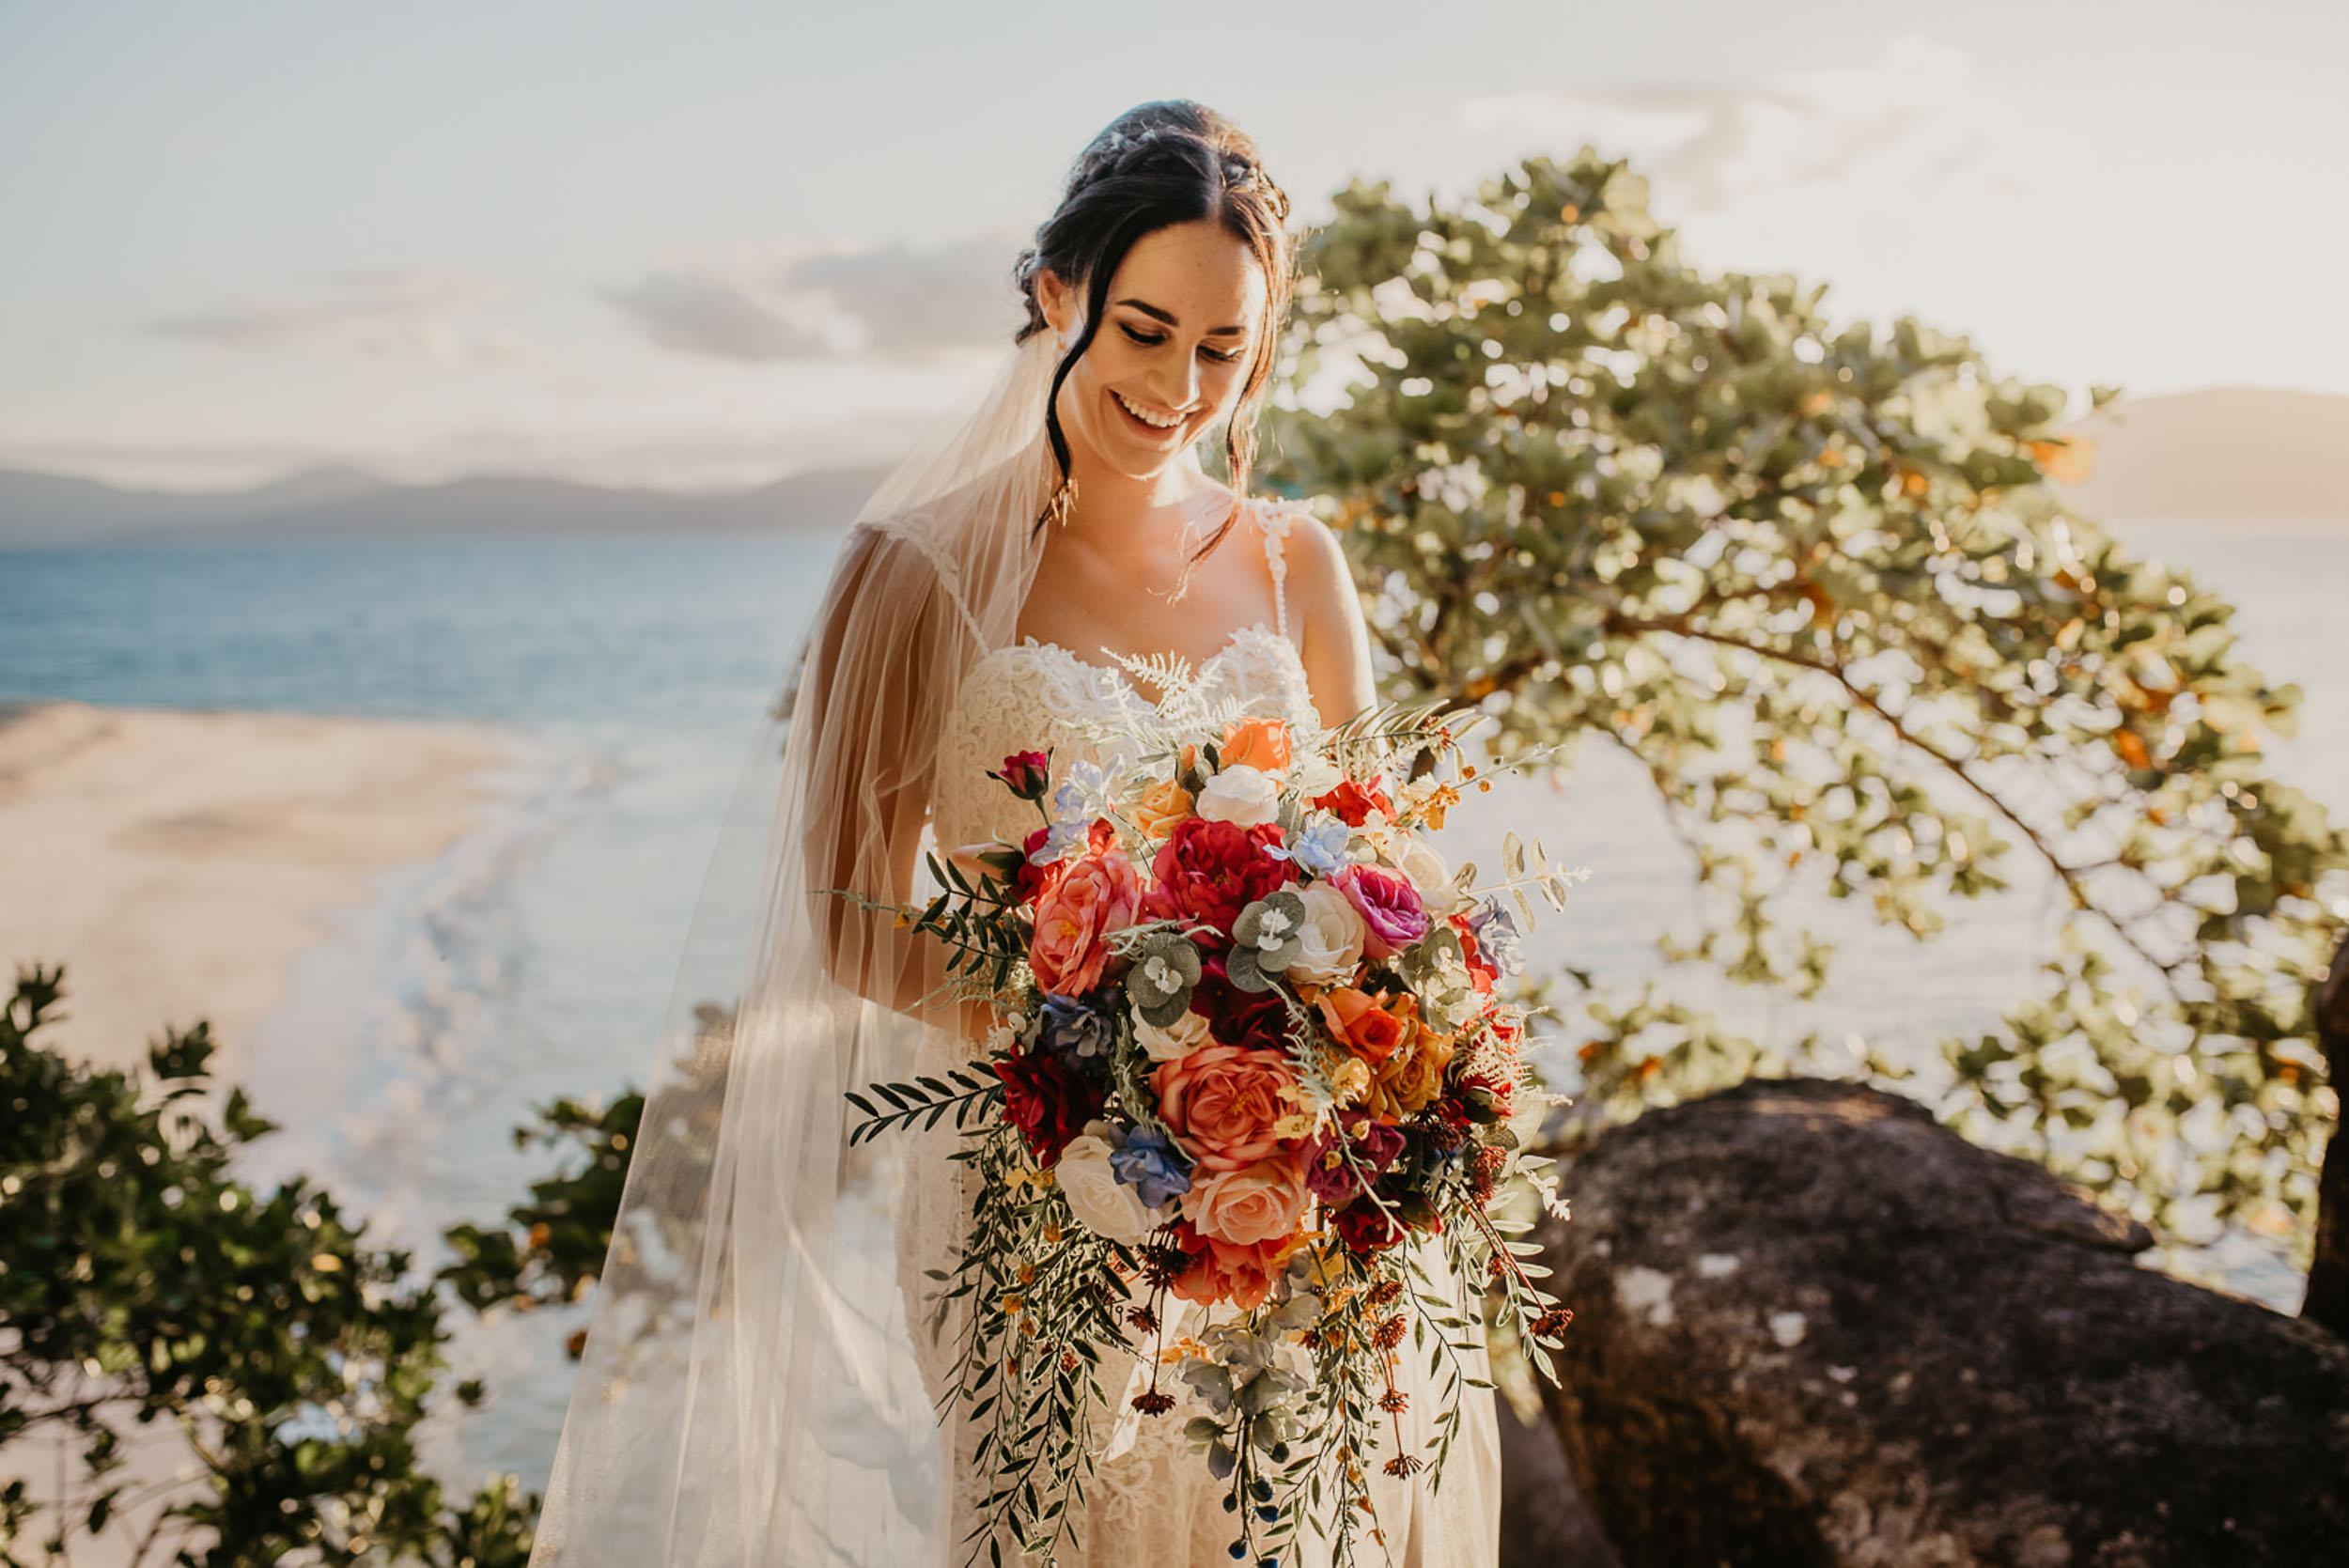 The Raw Photographer - Cairns Wedding Photographer - Fitzroy Island - Destination Wedding - Bride Dress - Groom Portrait - Queensland-35.jpg